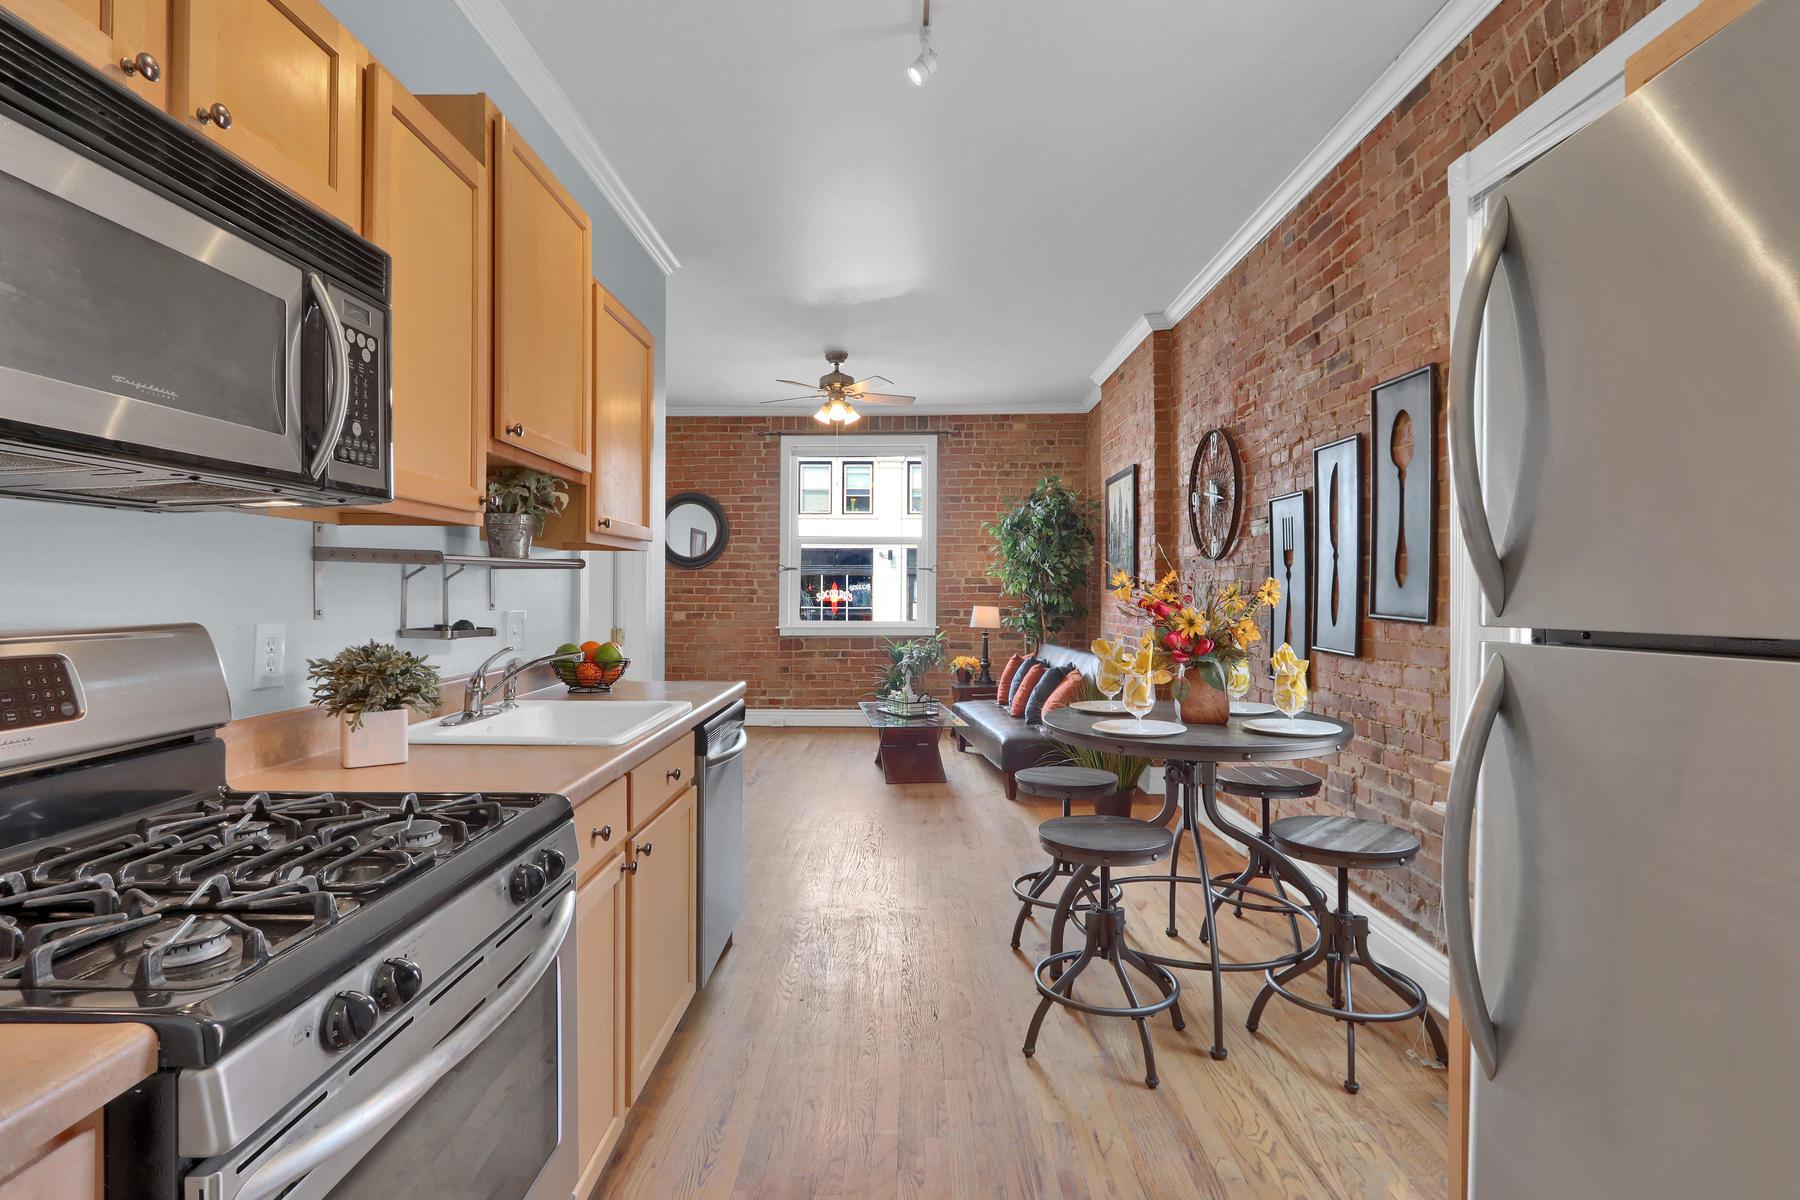 18 E Bayaud Ave Denver CO-001-1-Kitchen-MLS_Size.jpg